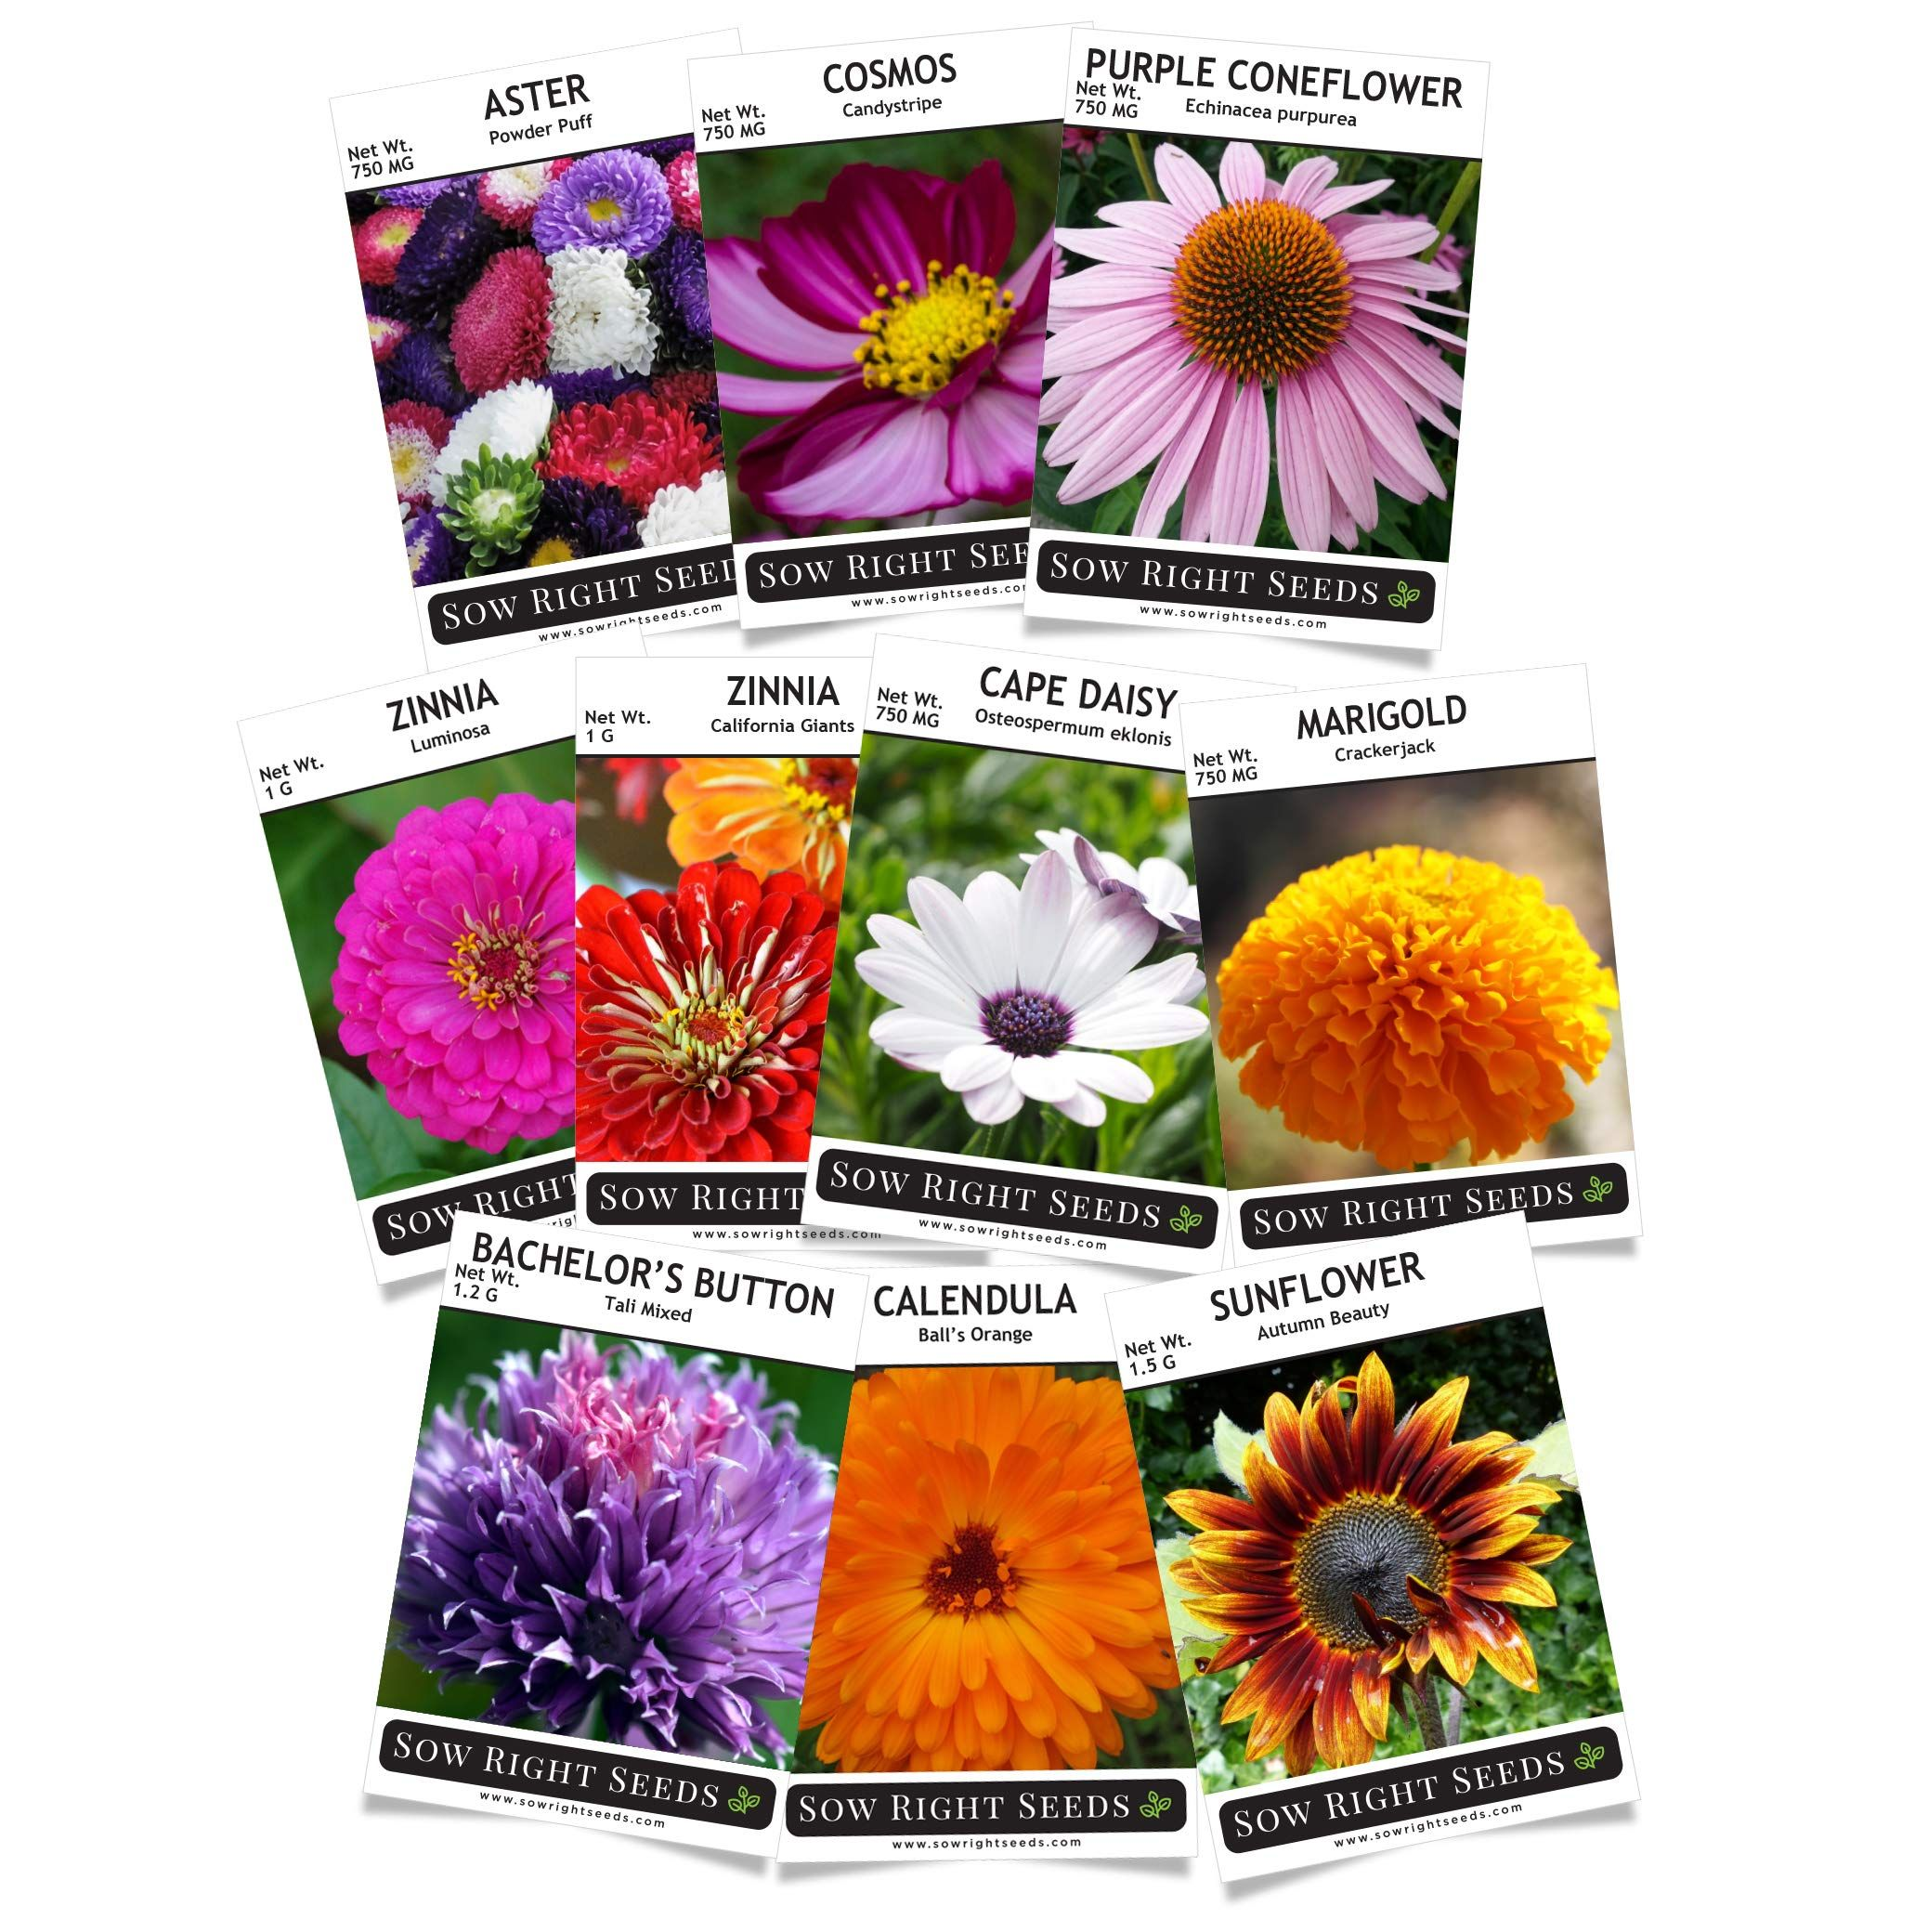 Sow Right Seeds Flower Seed Garden Collection Sunflower Marigold Zinnia Cosmos Daisy Calendula Coneflower Bachelor Zinnias Flower Seeds Garden Gifts